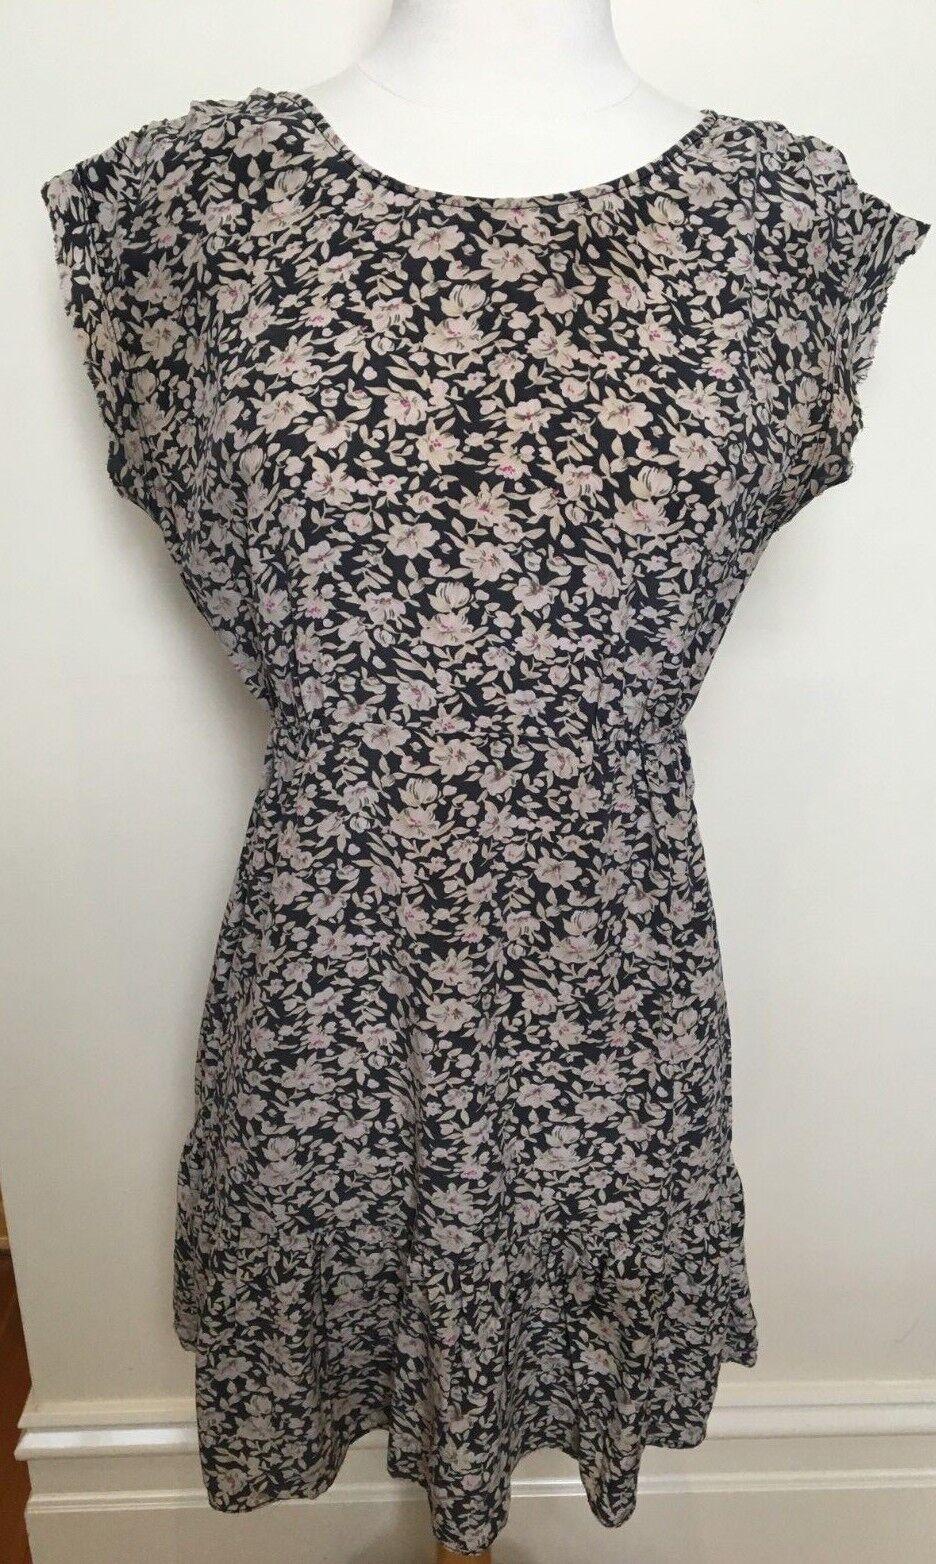 KACHEL Designer Beige Flower Print Silk Cap Sleeve Elastic Waist Tea Dress 6